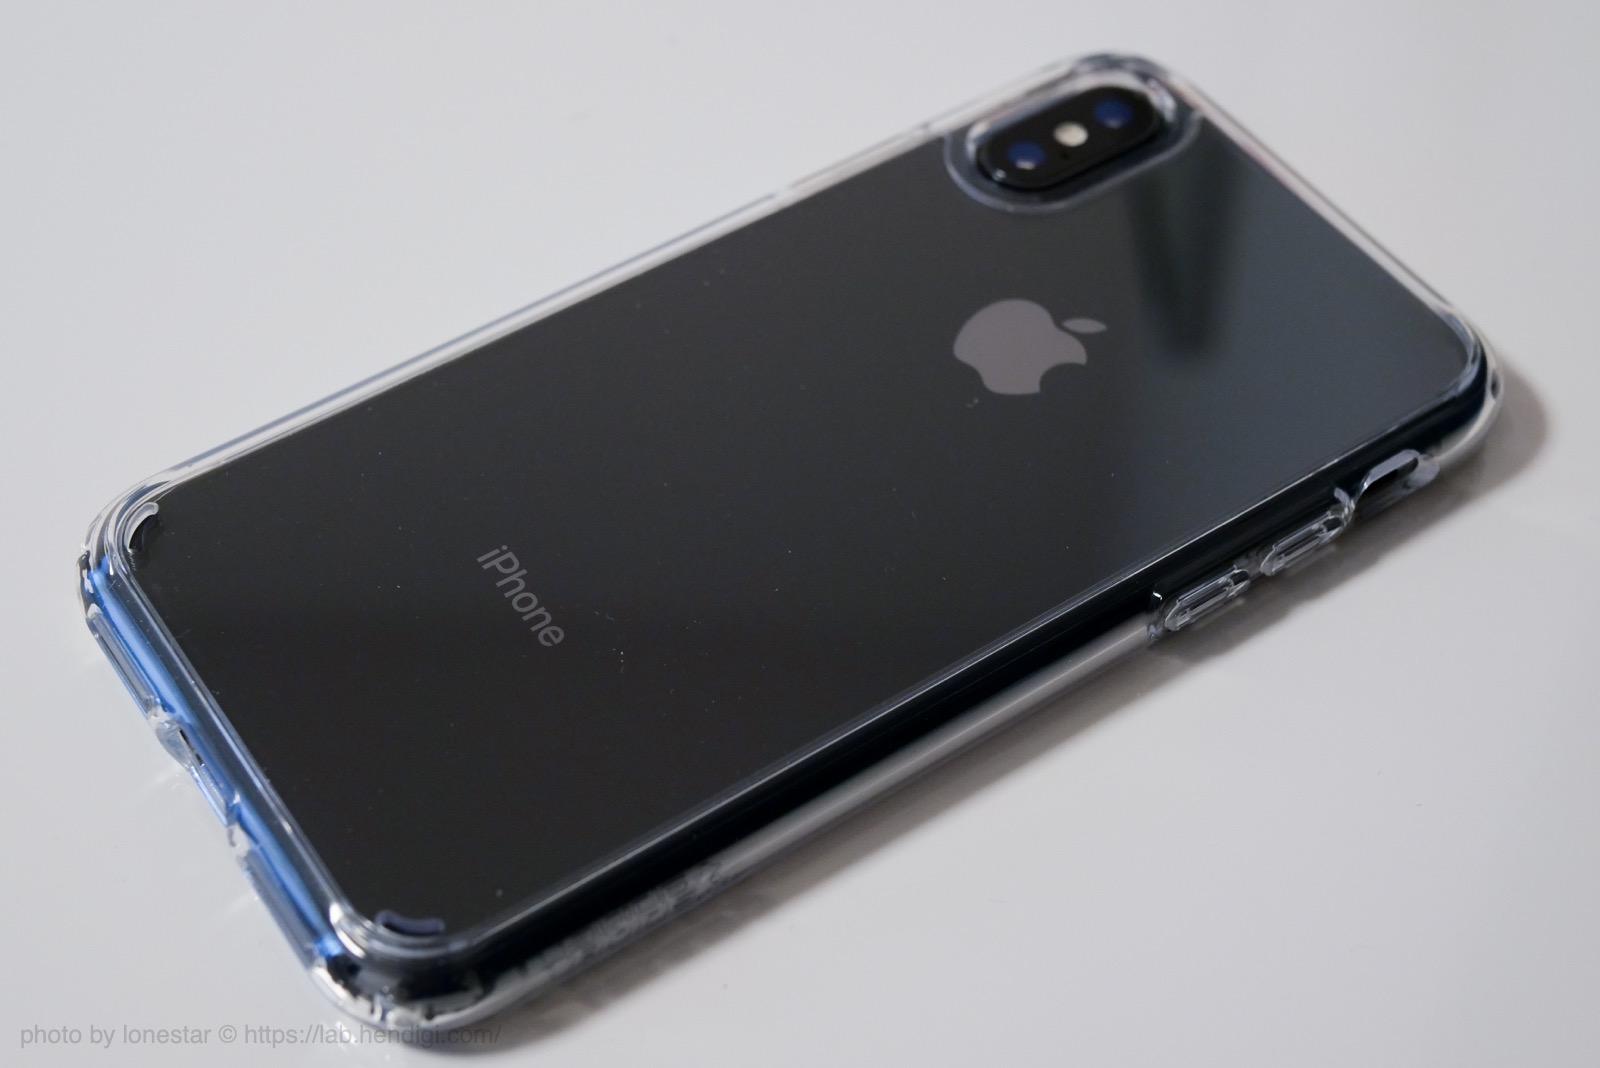 Spigen iPhone X ケース レビュー